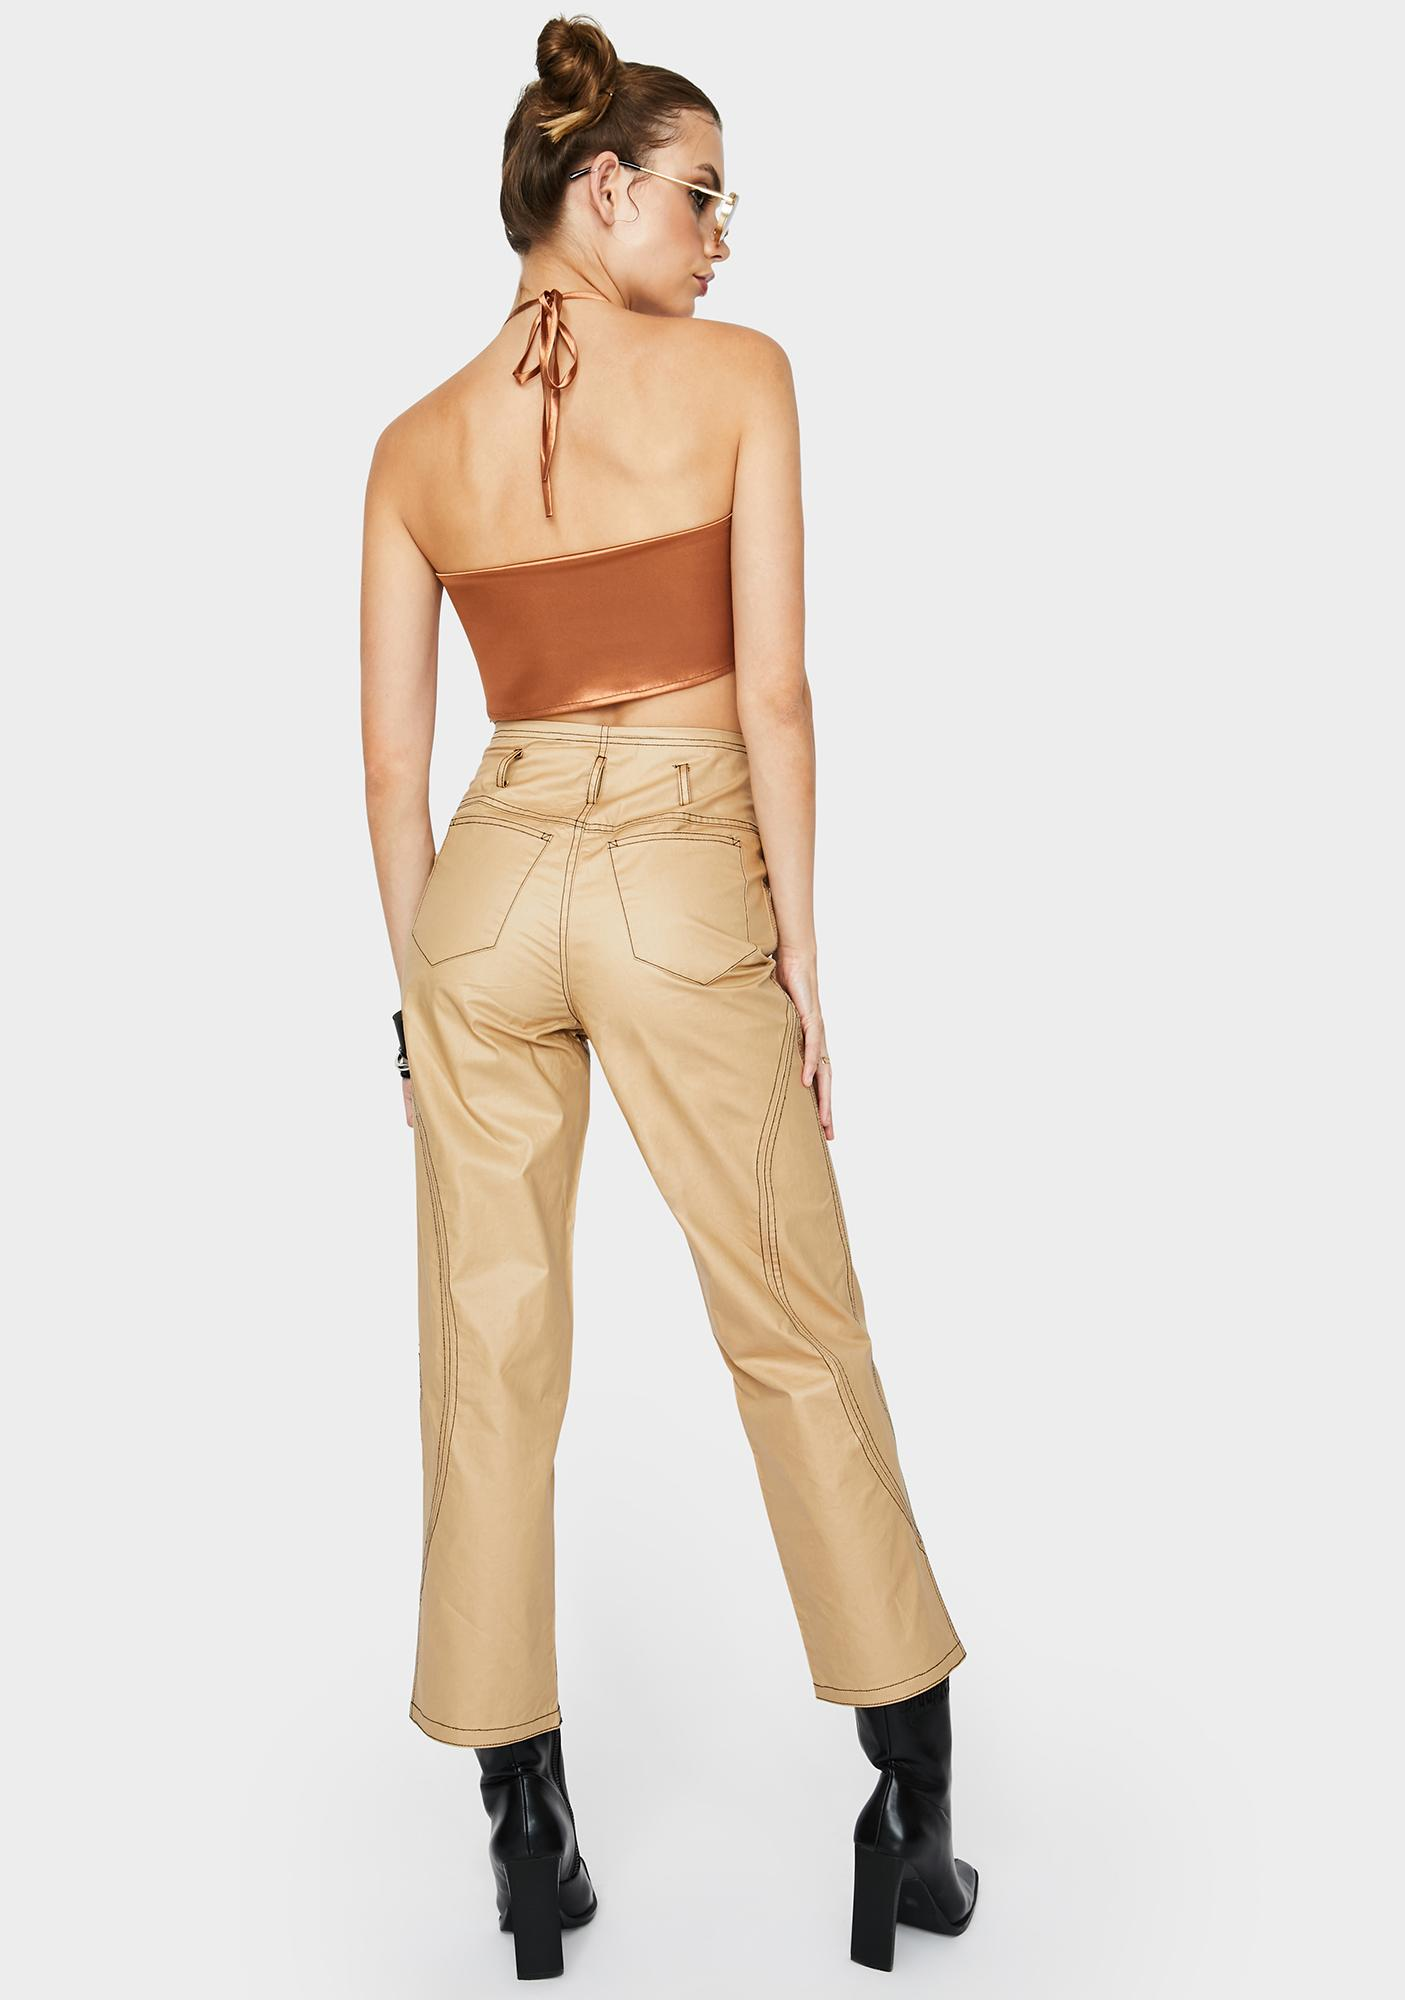 ZEMETA Beige Glossy High Waist Pants